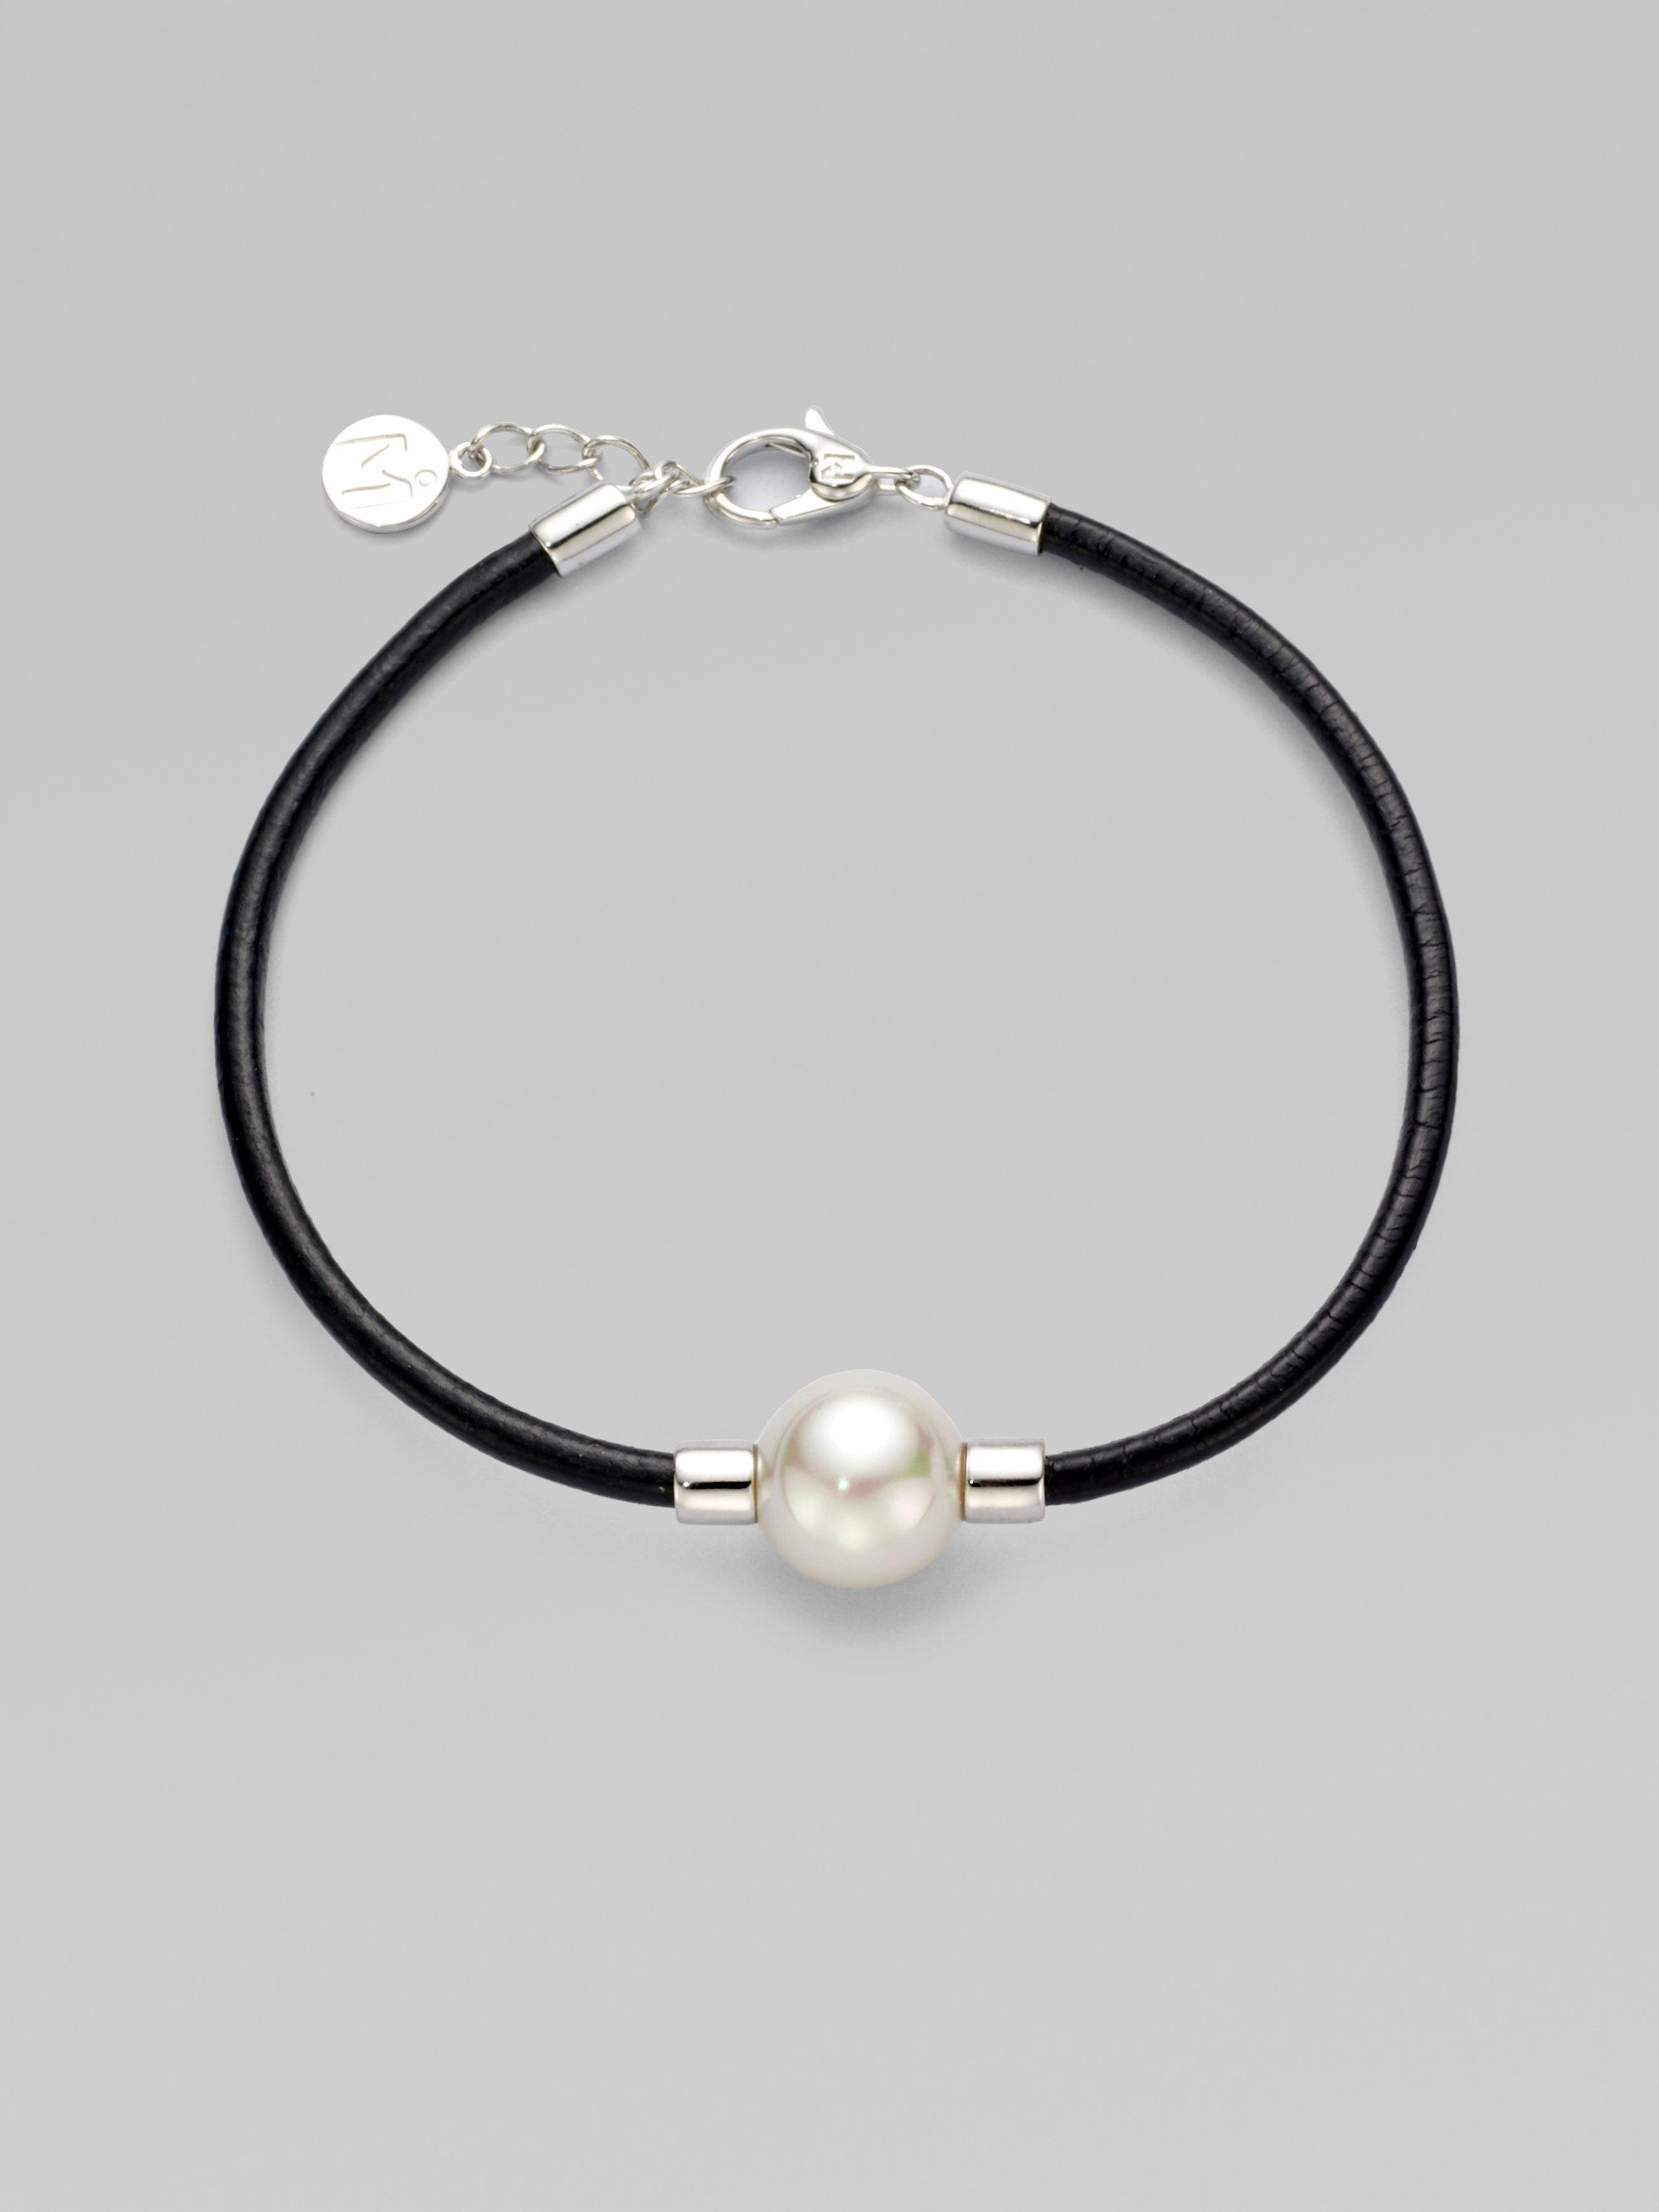 Majorica 12mm Round White Pearl Leather Bracelet In Black